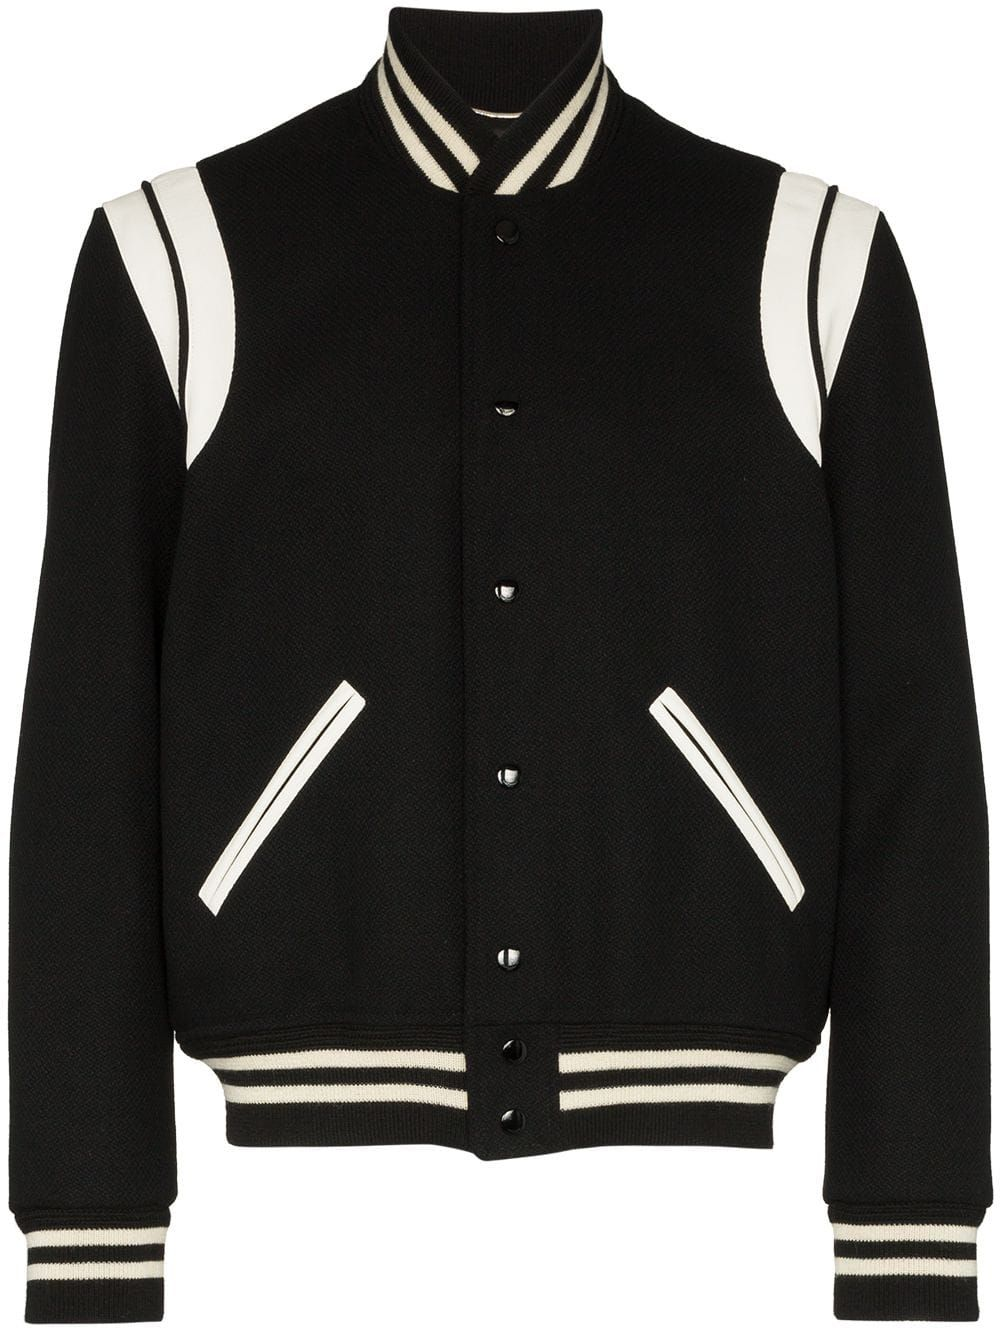 Saint Laurent Teddy Bomber Jacket Farfetch In 2021 Teddy Jacket Black Bomber Jacket Varsity Jacket [ 1334 x 1000 Pixel ]